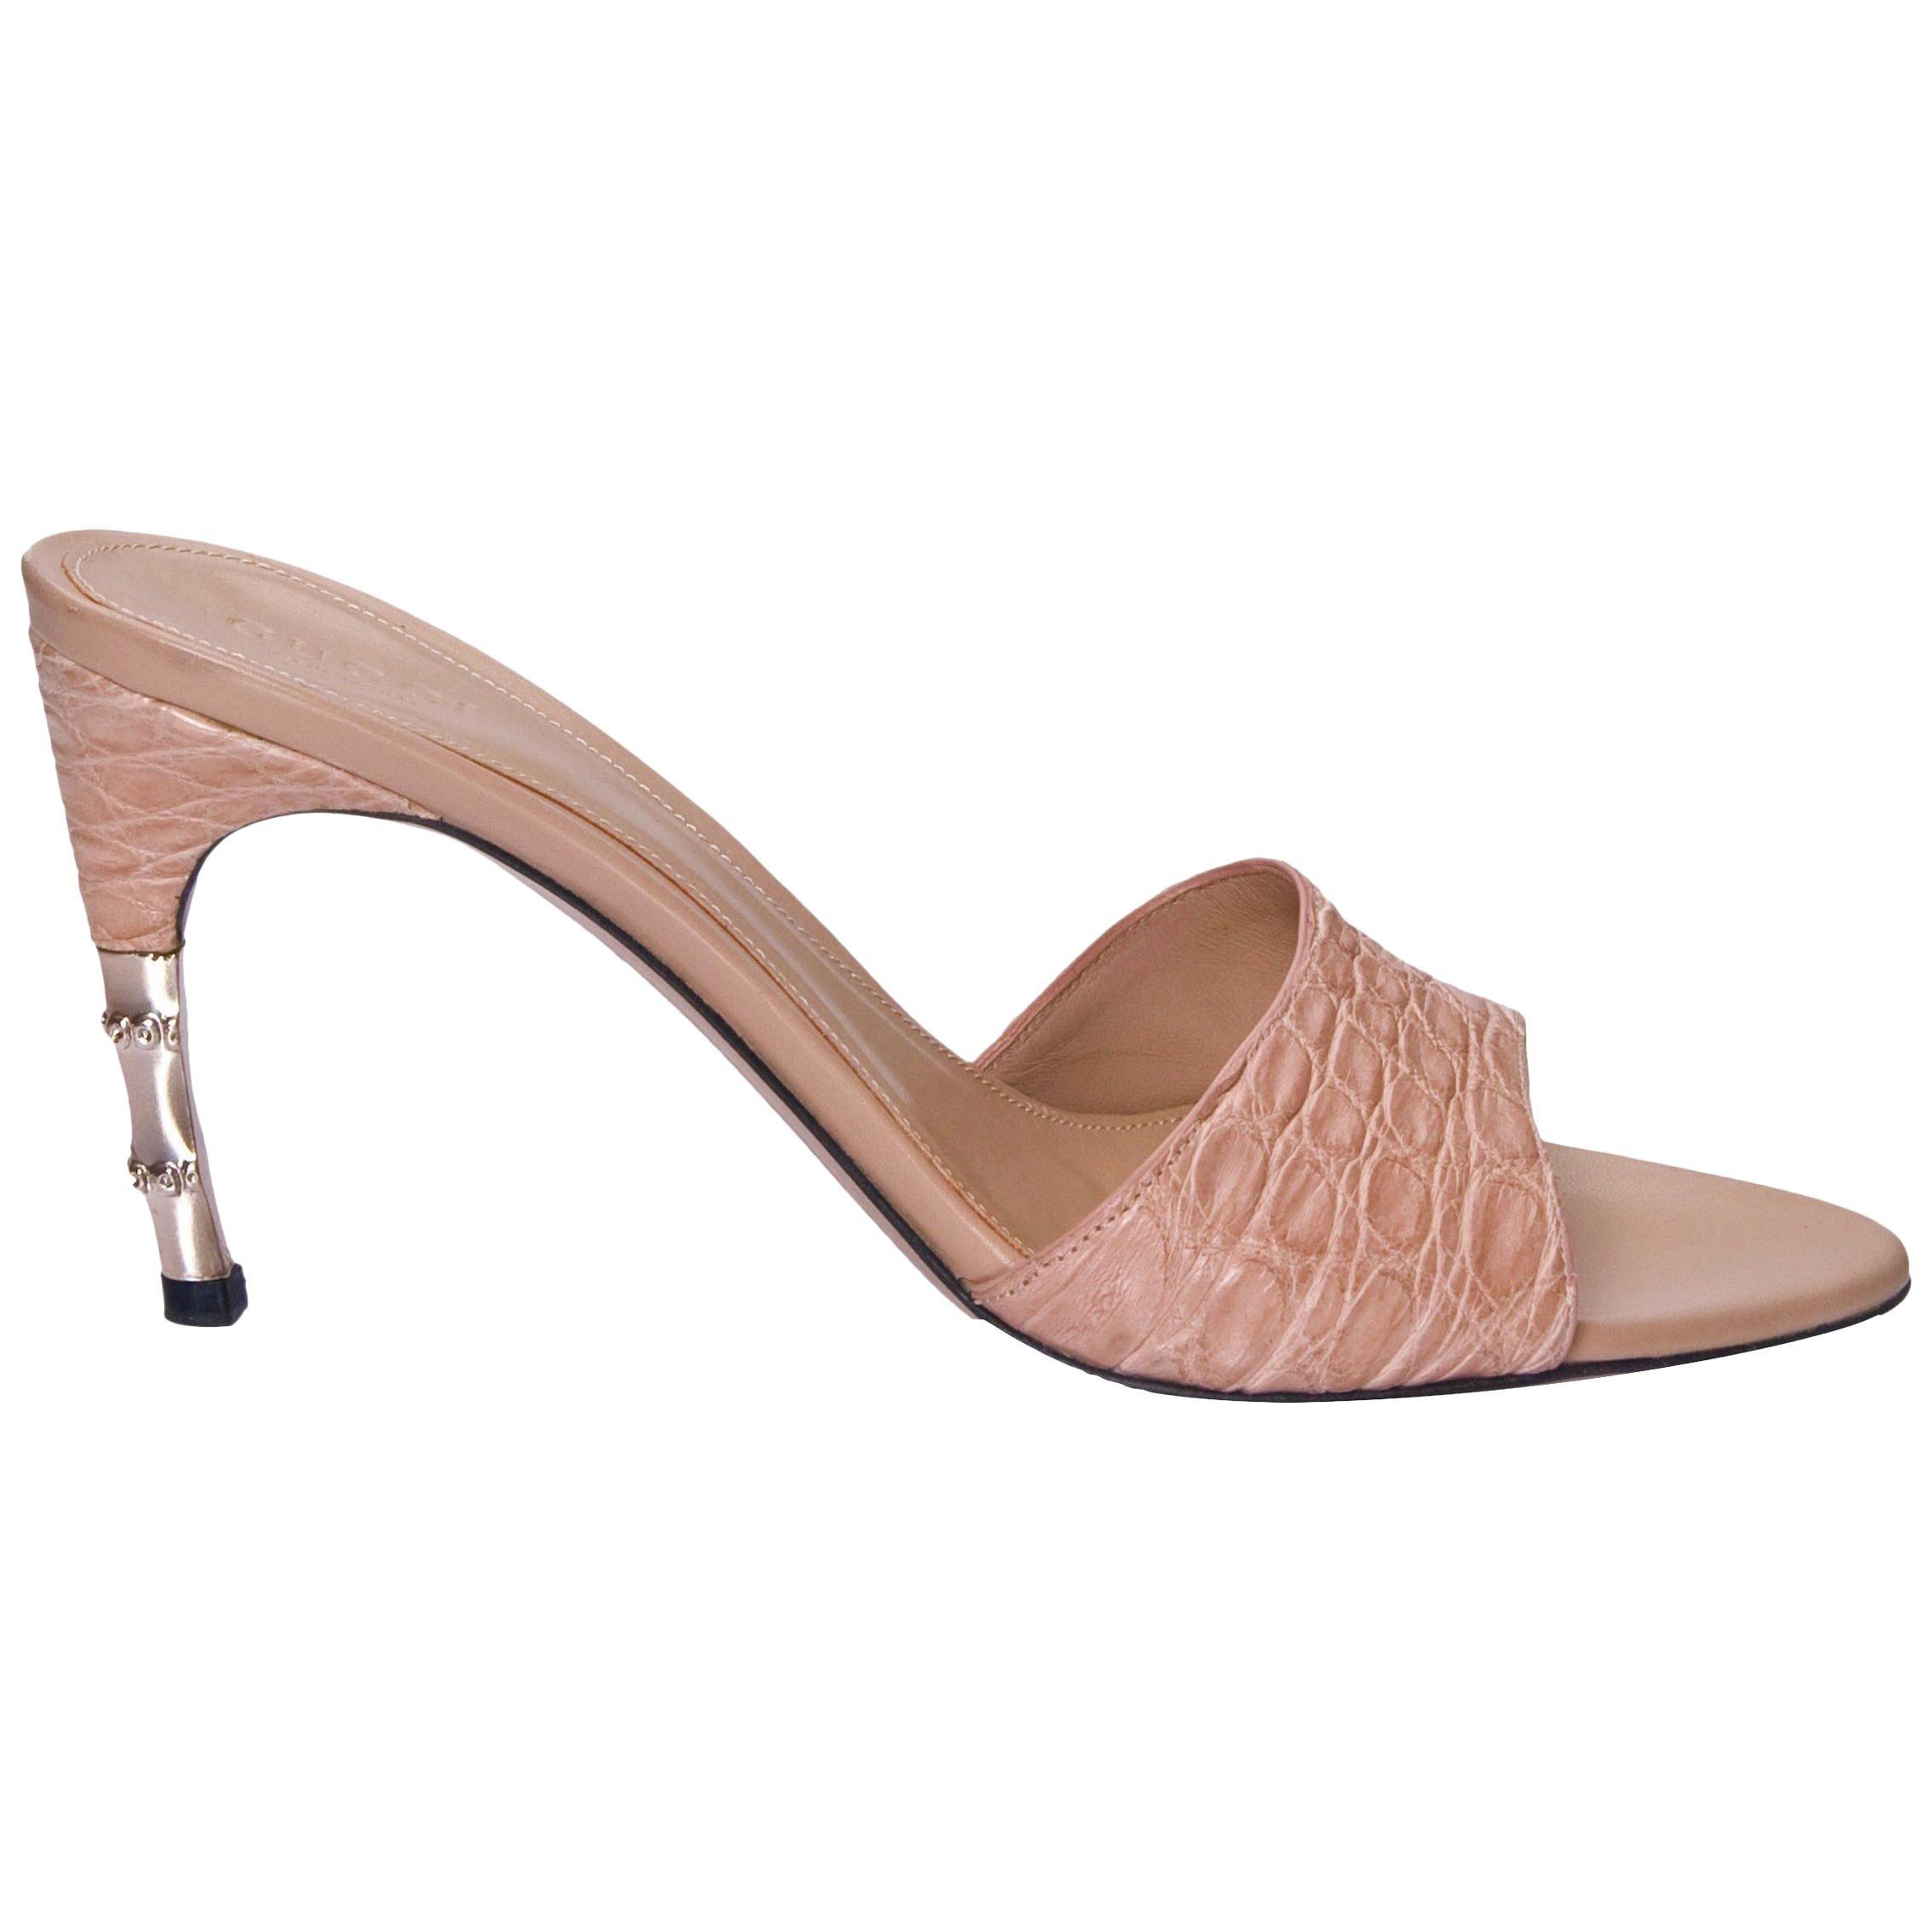 e5a0eb4cc32 Shoes on Sale at 1stdibs